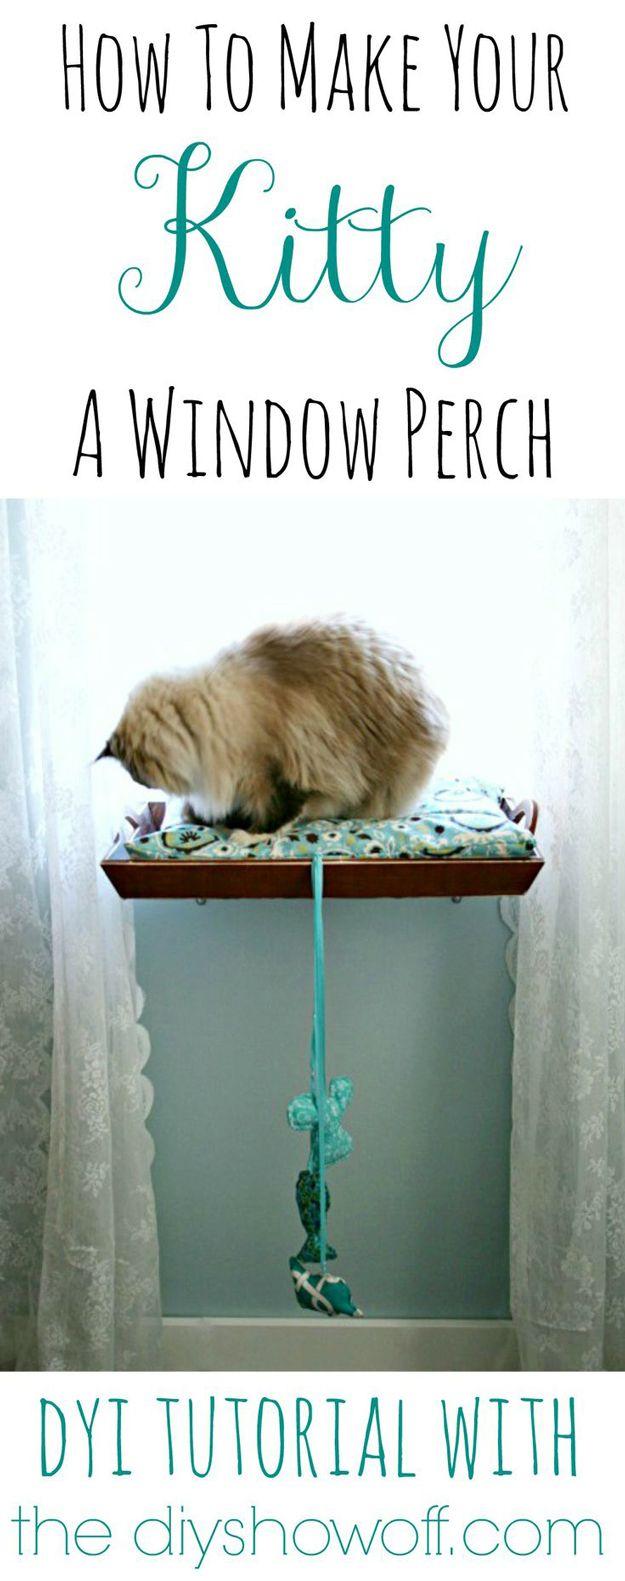 Pet proyecto de bricolaje Tutoriales | http://artesaniasdebricolaje.ru/best-diy-pet-projects-to-keep-your-furry-friends-happy/